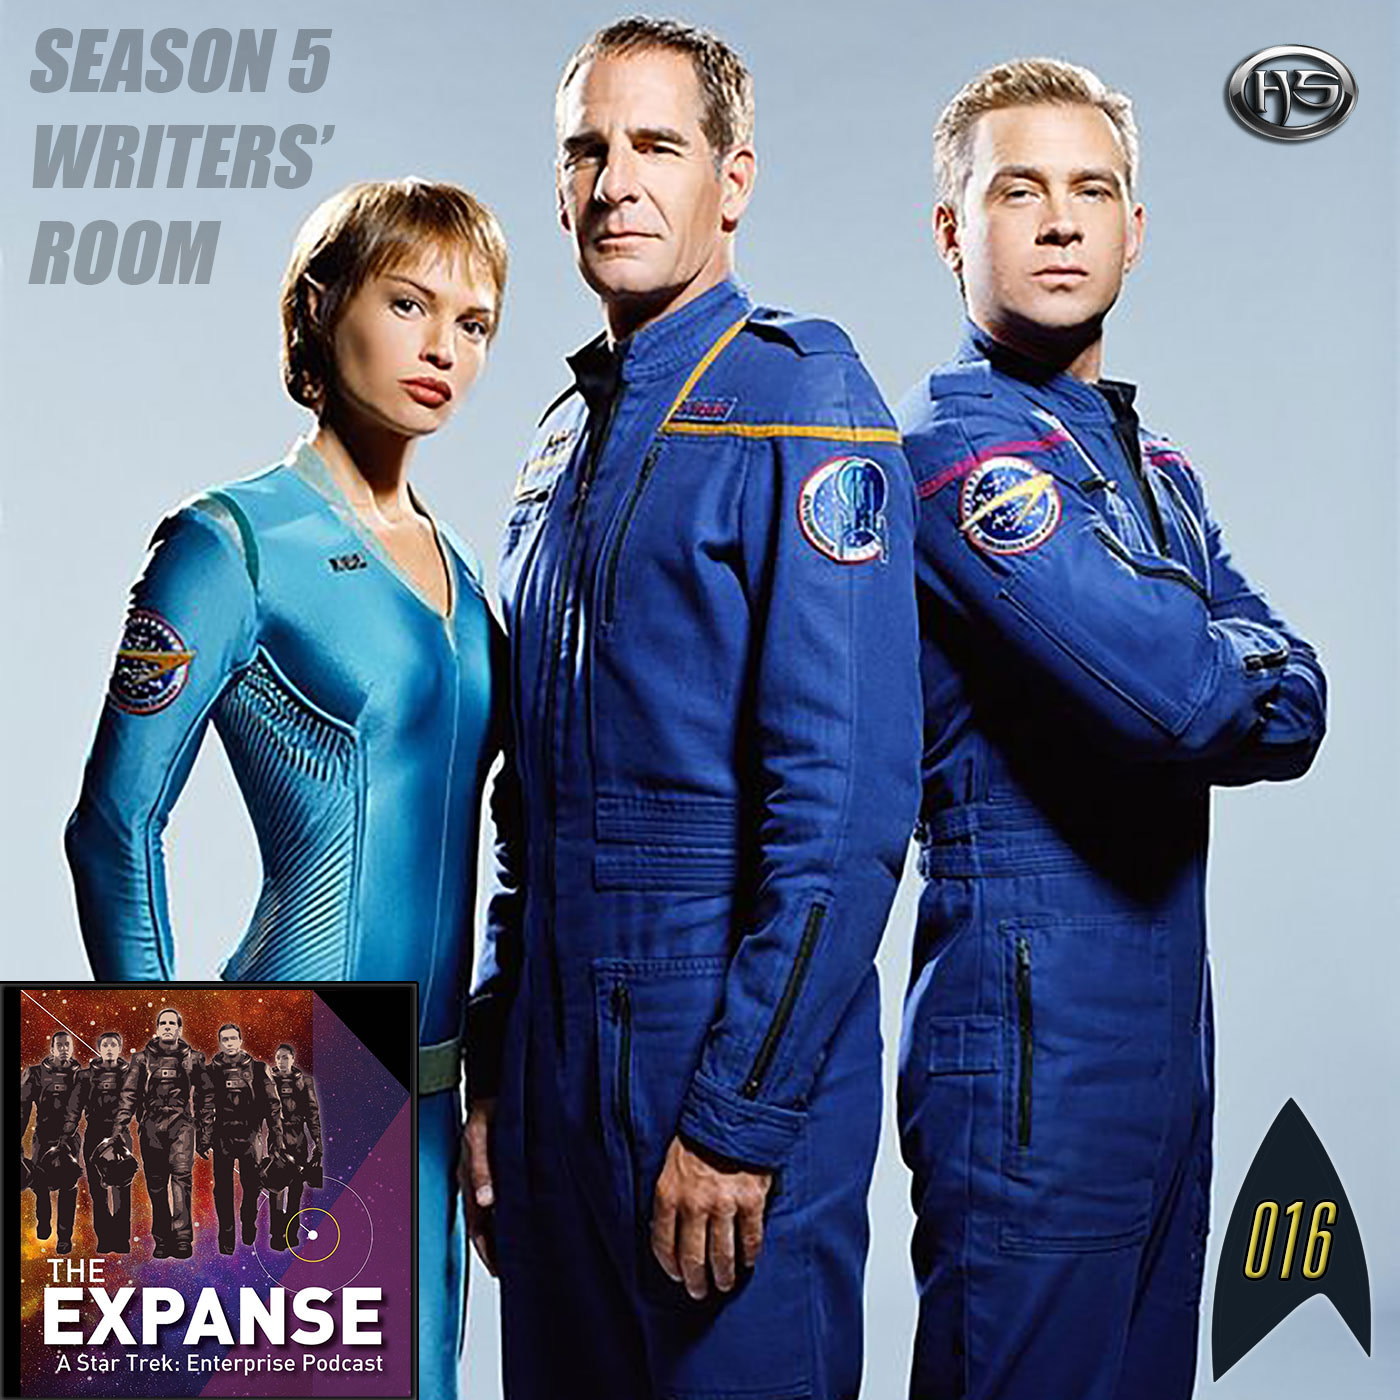 The Expanse Episode 16